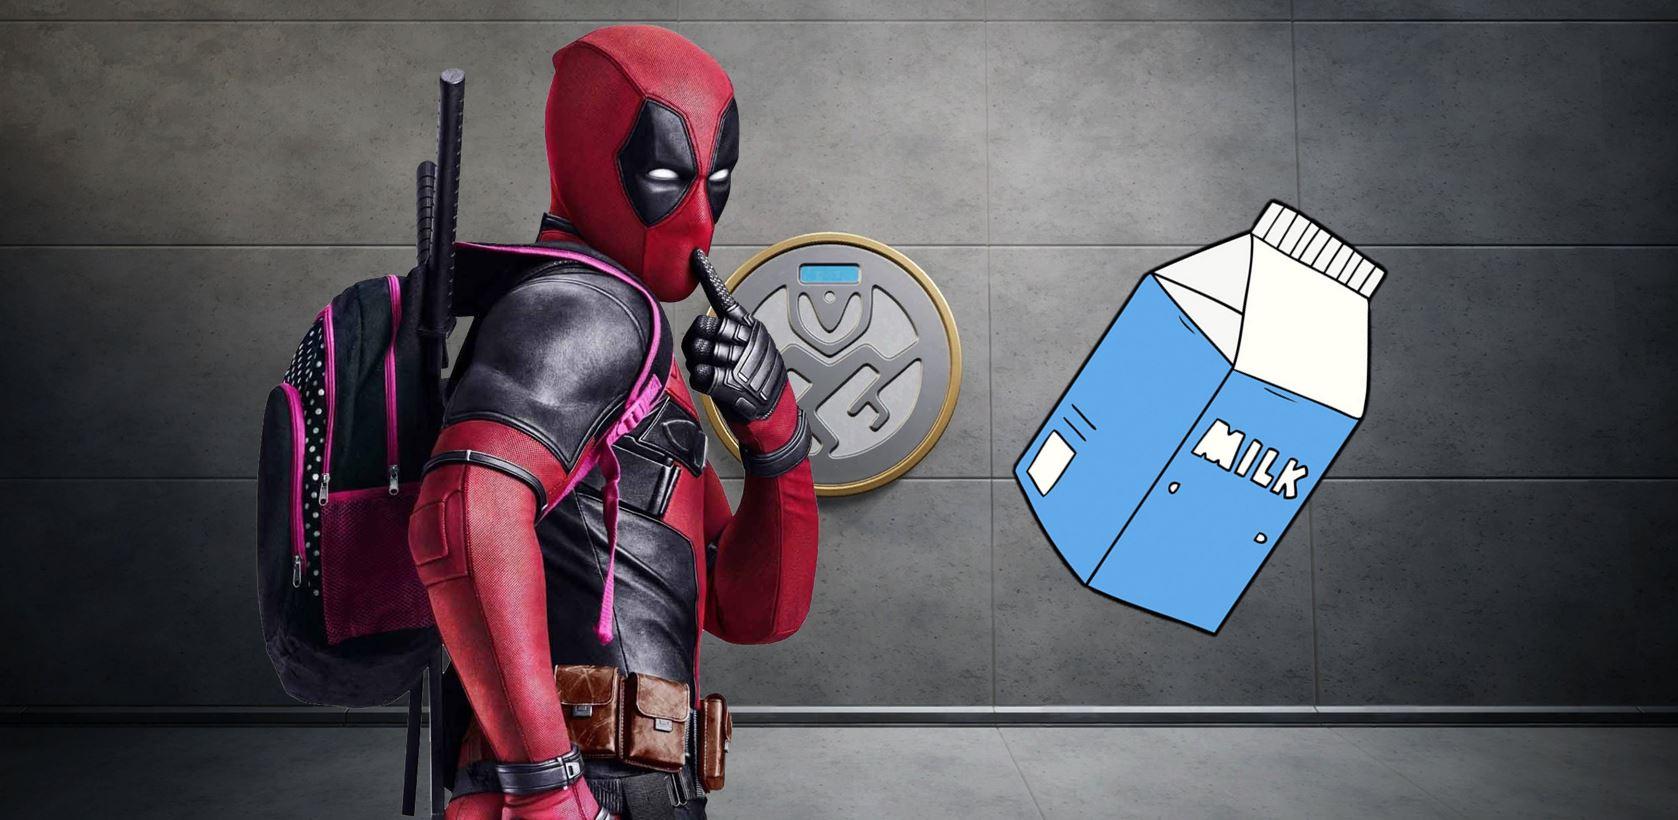 C:\Users\Yousef Shafi\Desktop\Find Deadpools Milk Carton Fortnite.jpg